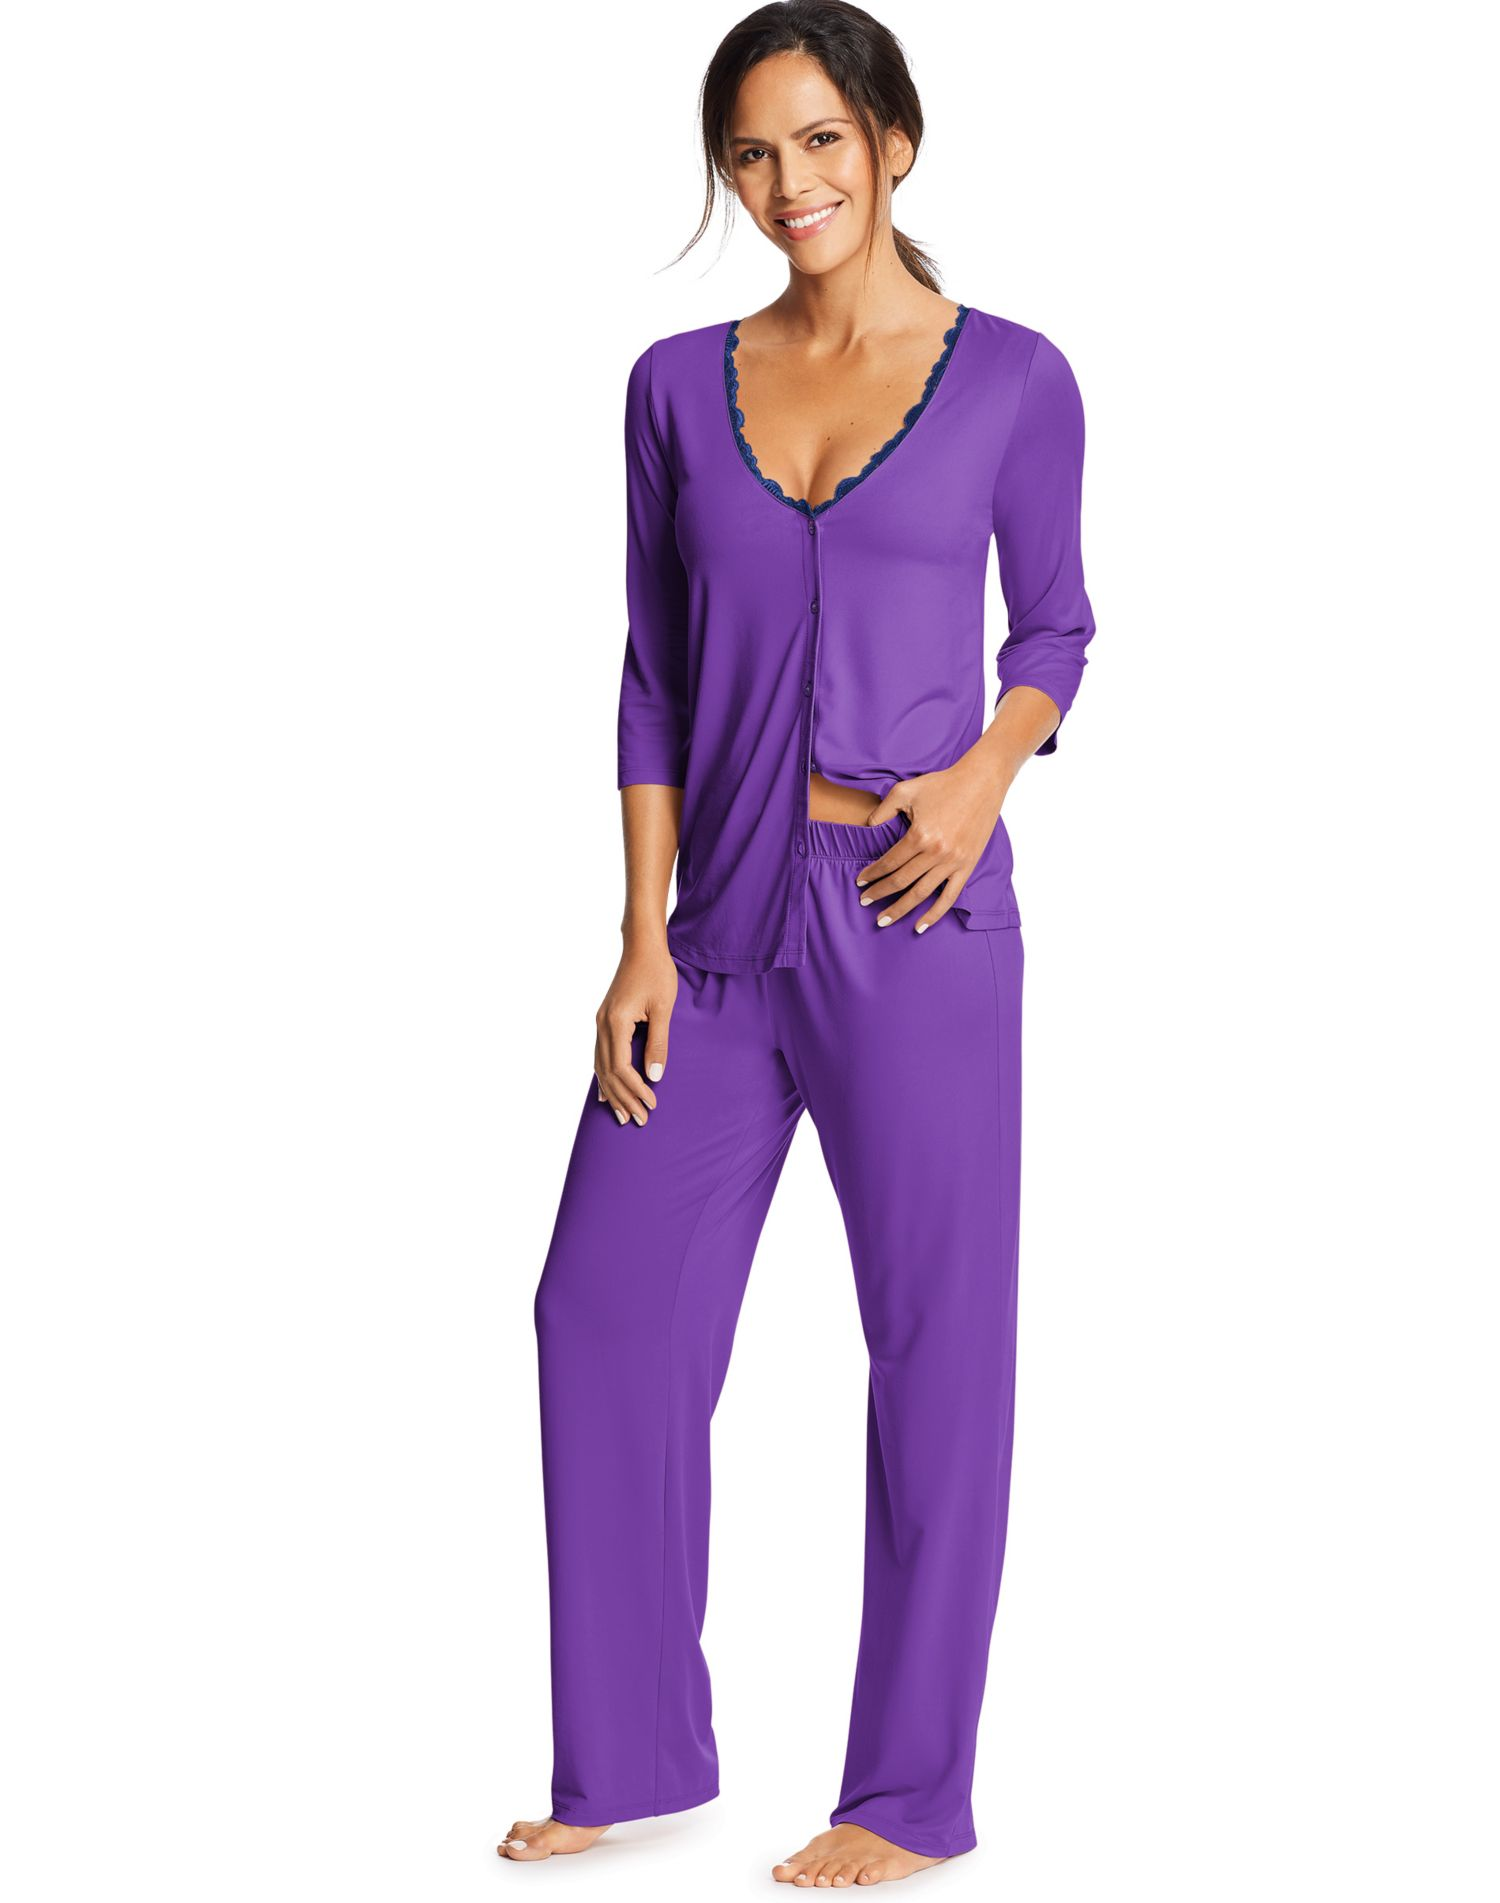 72ba620204f7 Maidenform Womens Lace Trim Knit PJ Set